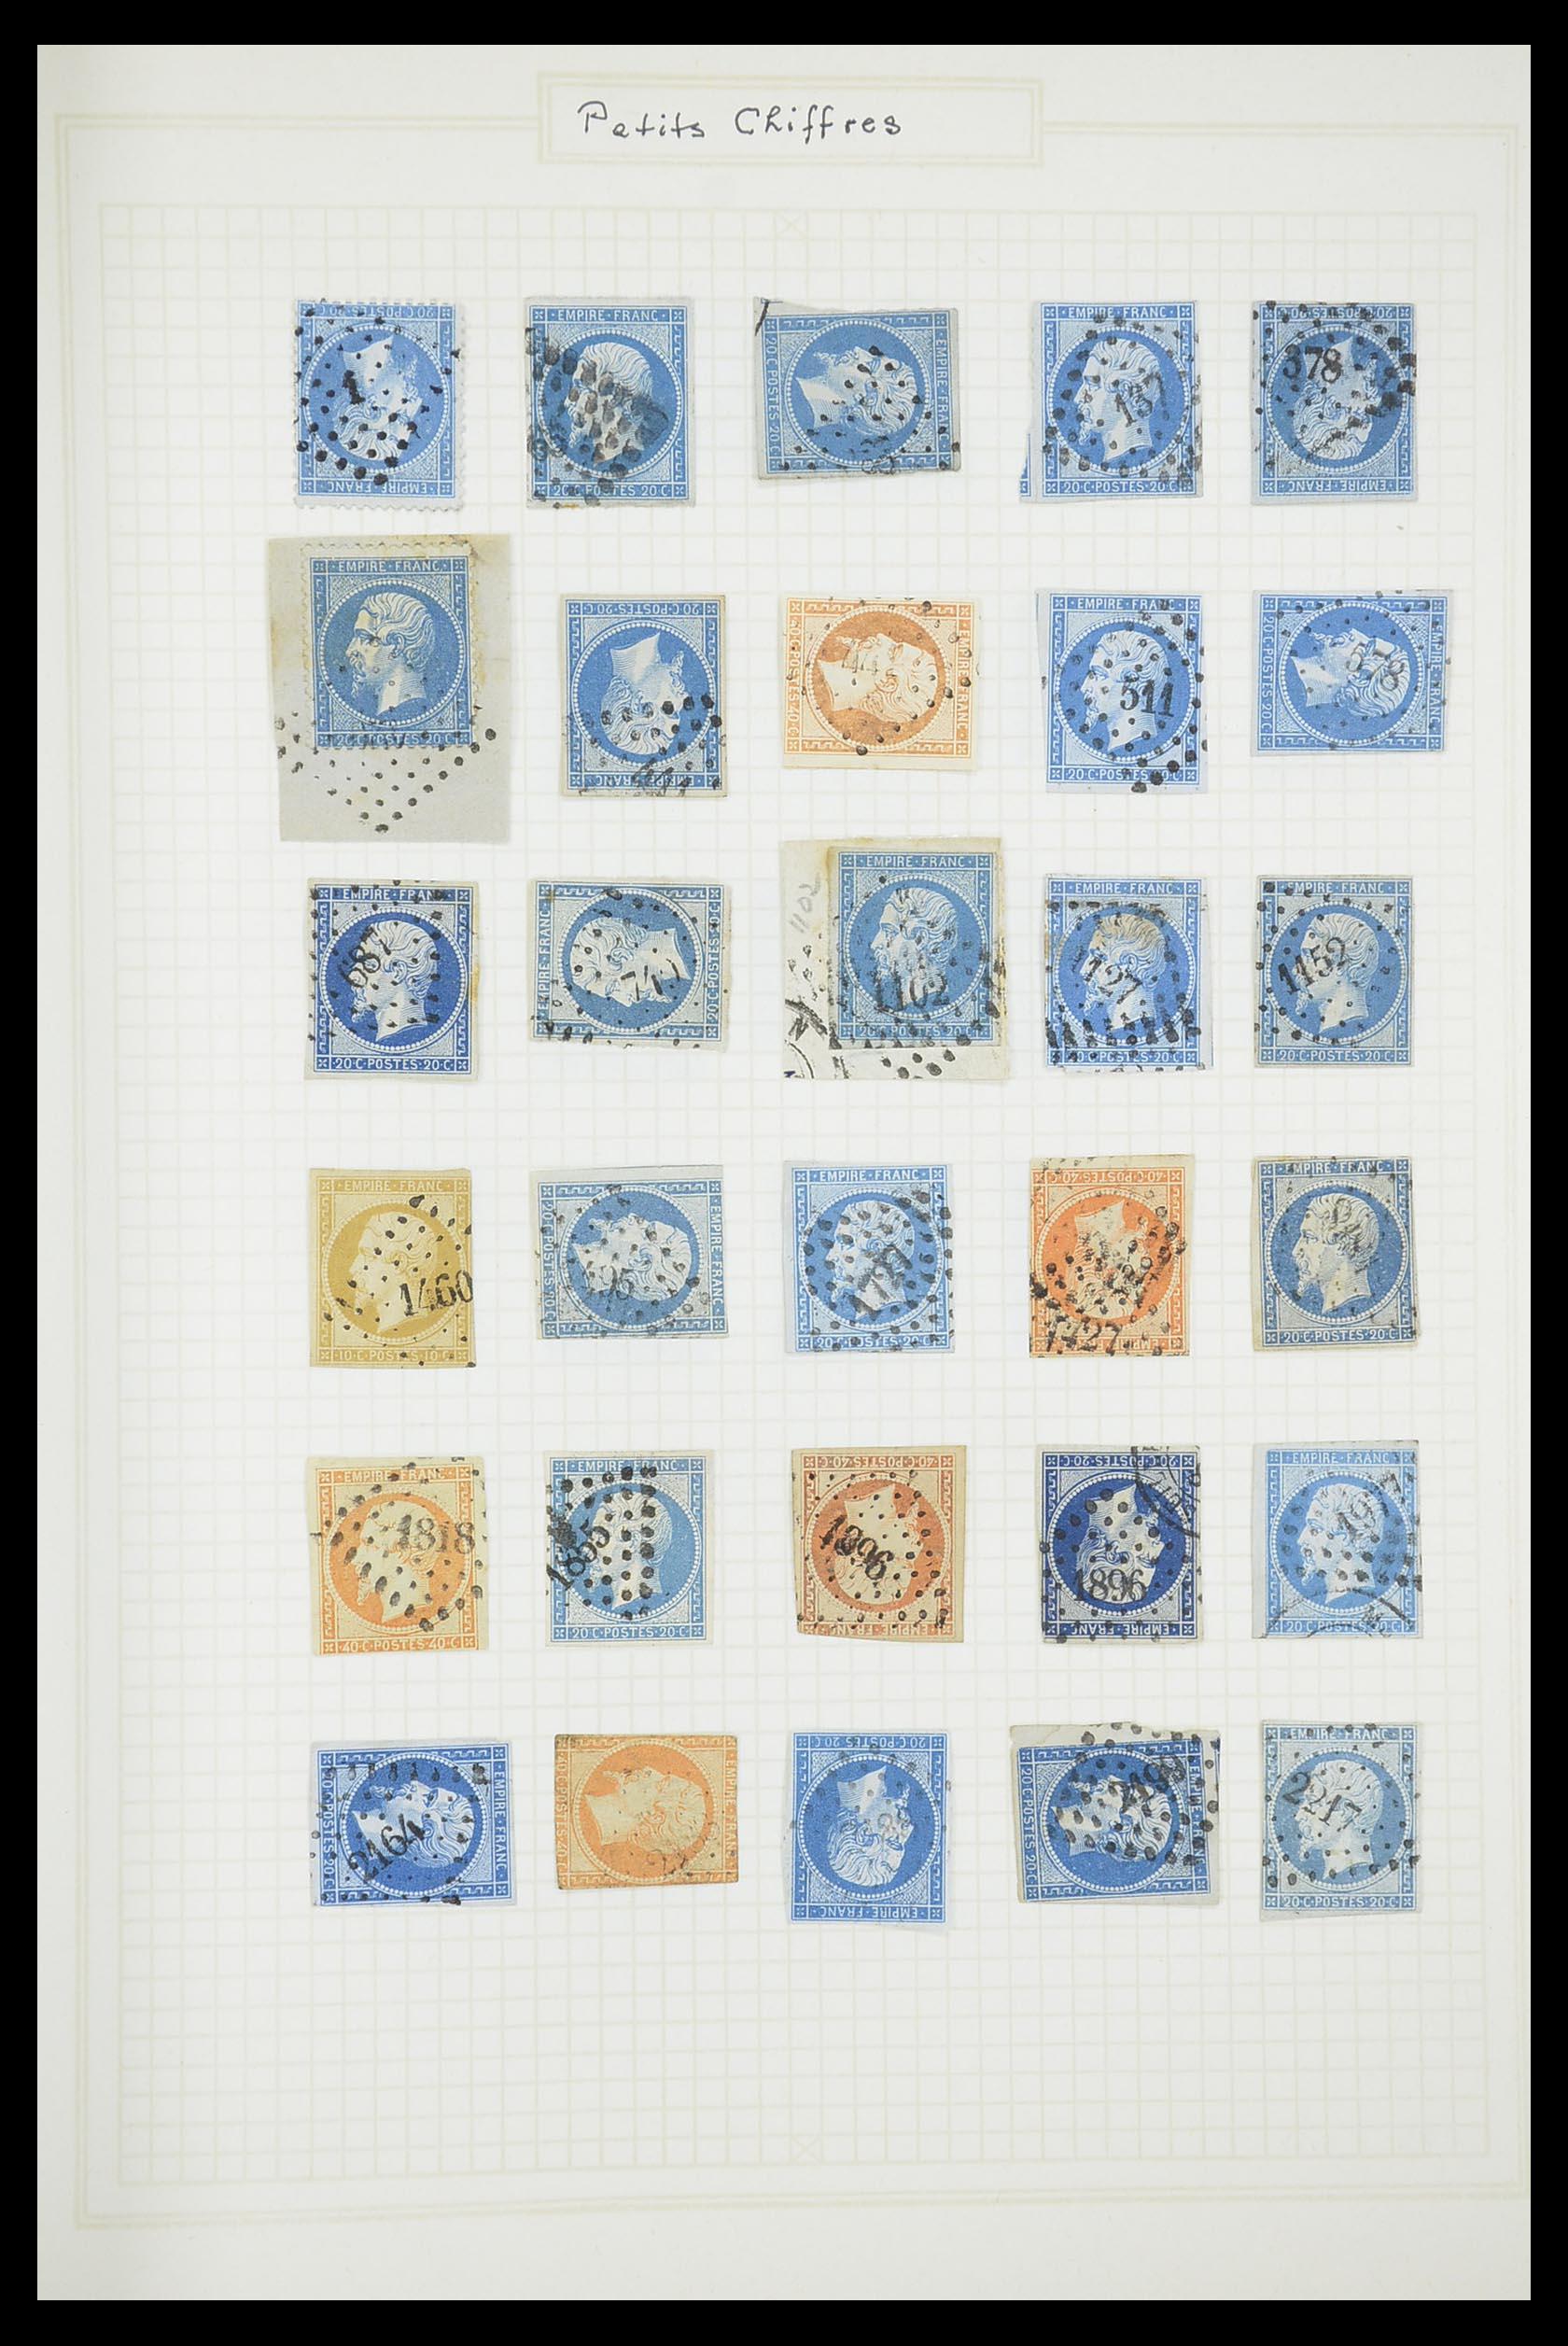 33851 009 - Postzegelverzameling 33851 Frankrijk klassiek stempels.